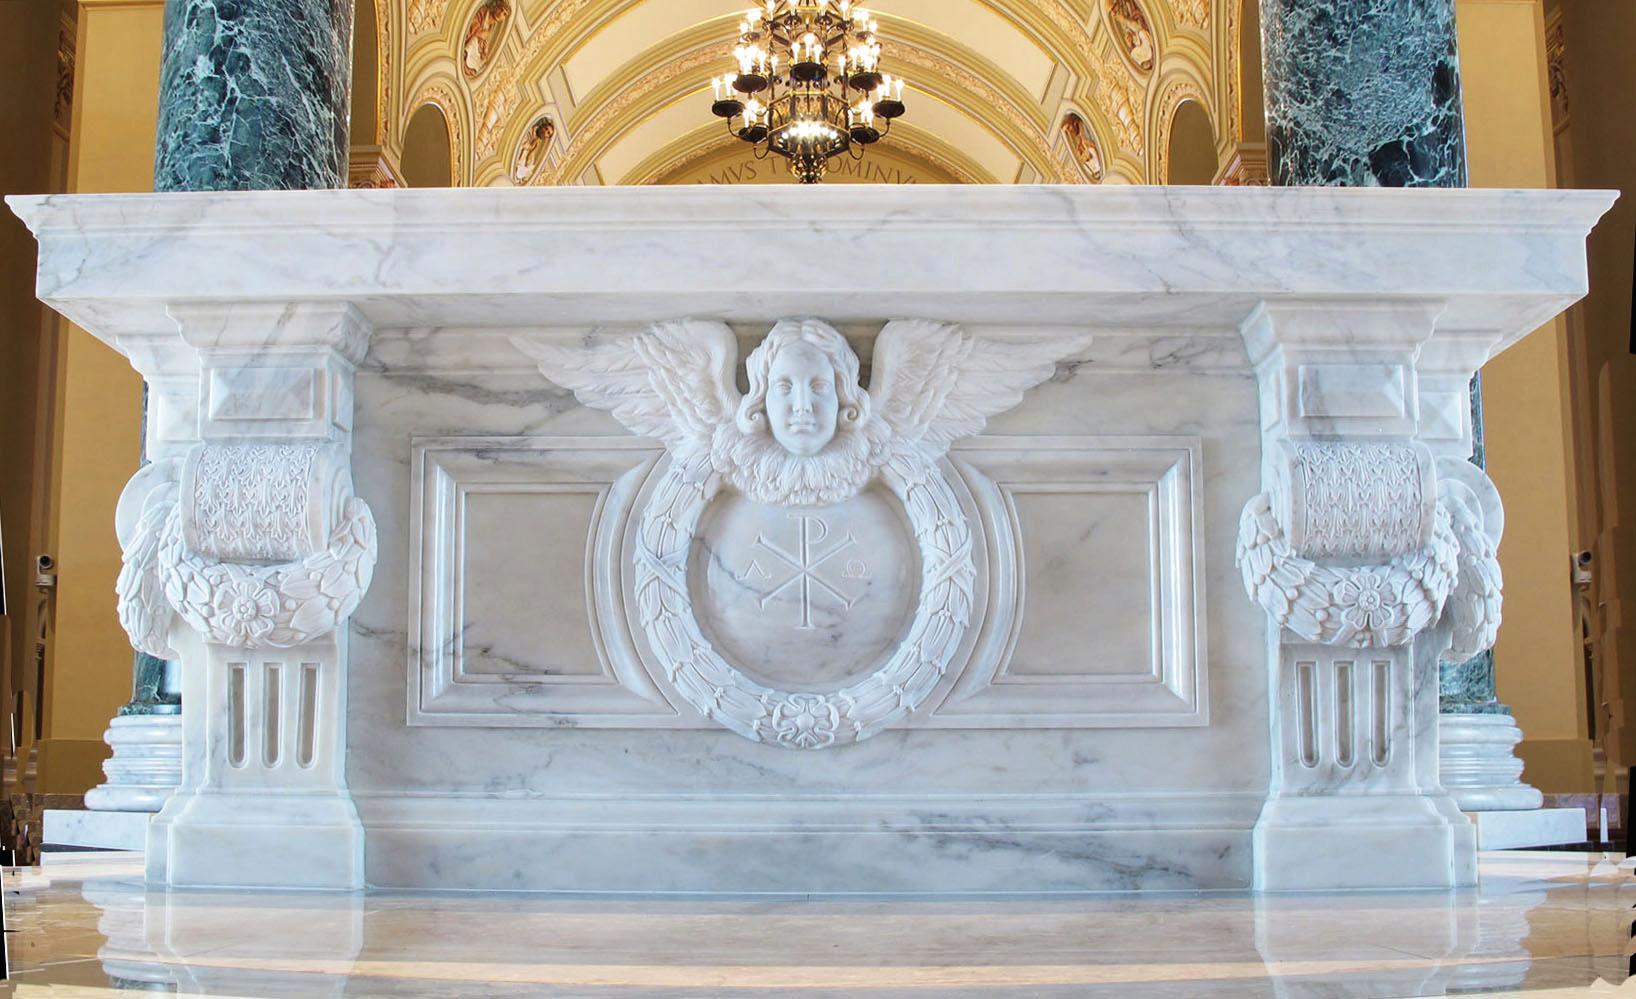 Altar As Alter Christus Ontology And Sacramentality Adoremus Bulletin